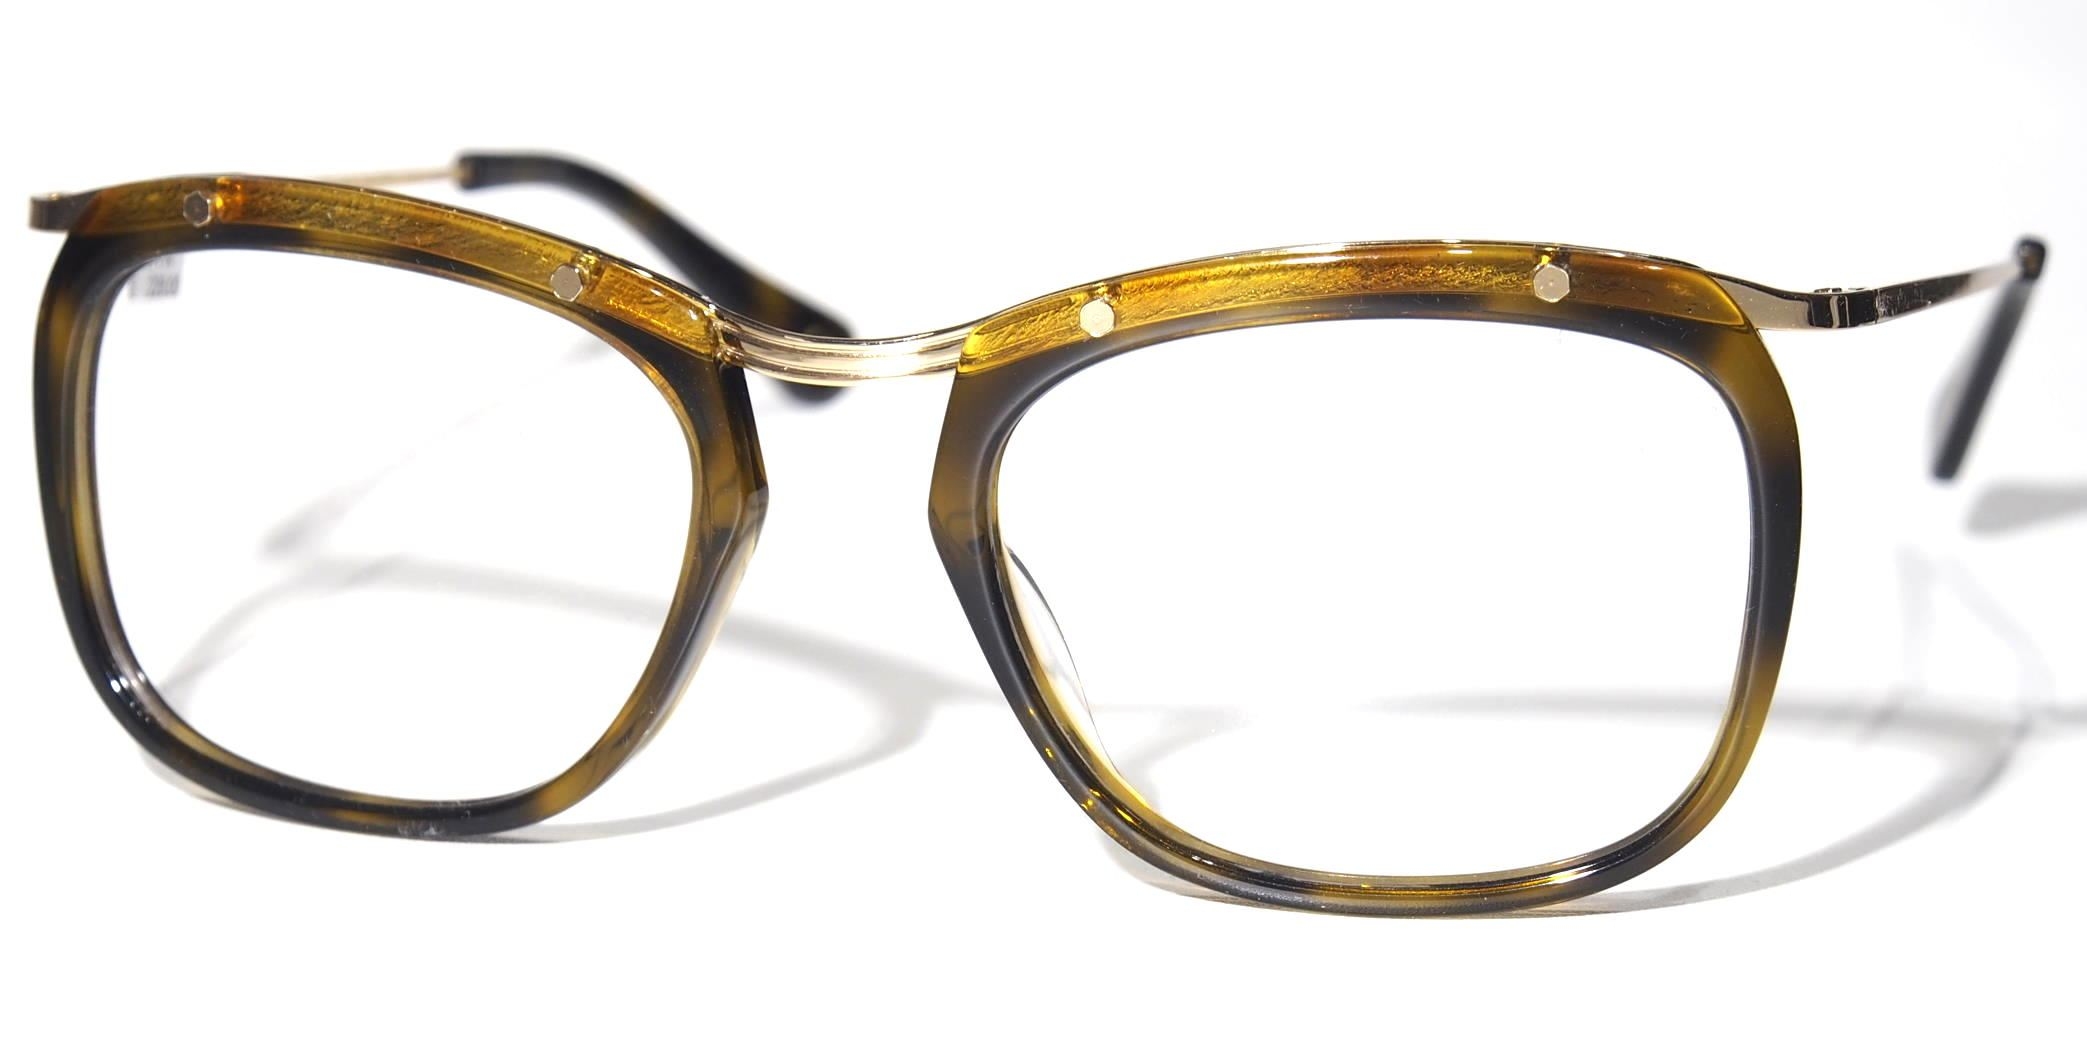 Lesca Lunettes, Lesca eyewear, Cutis M. c.8906, Brillengestell